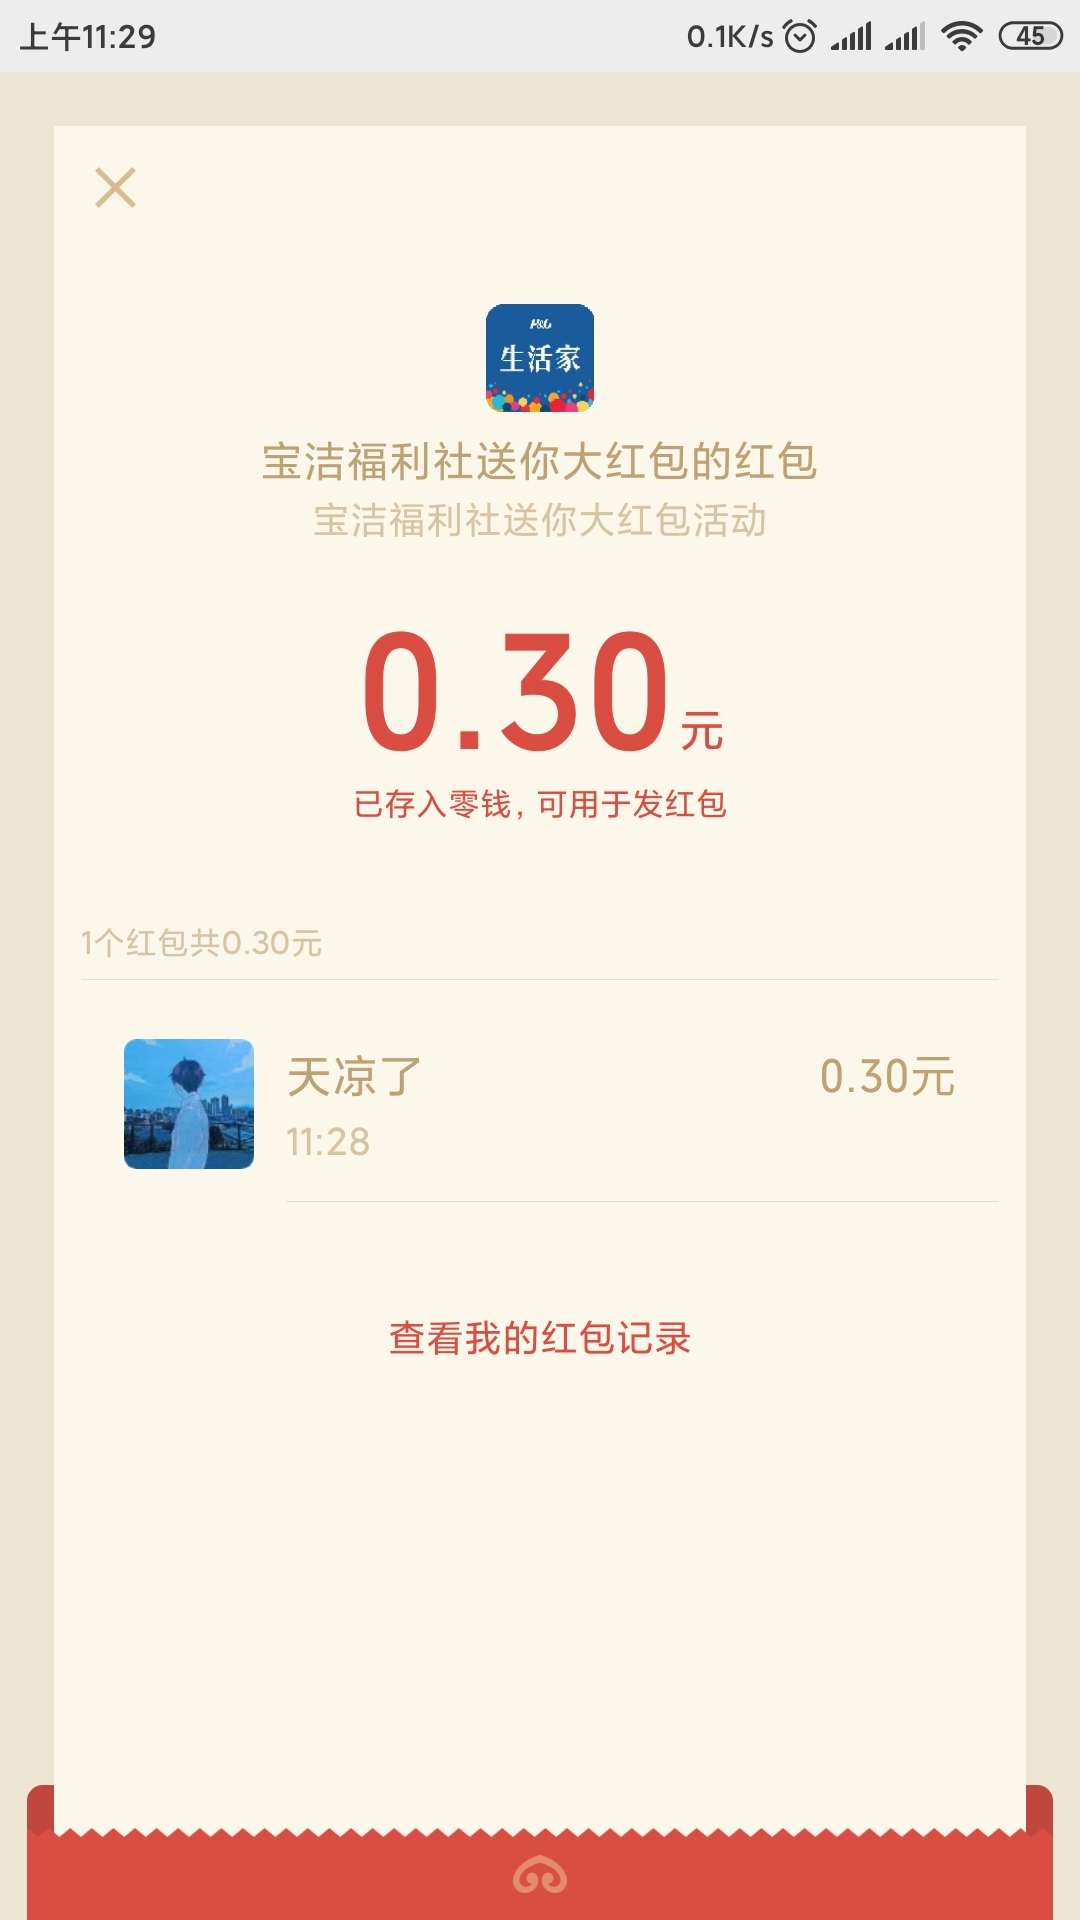 Screenshot_2020-06-14-11-29-11-028_com.tencent.mm.jpg